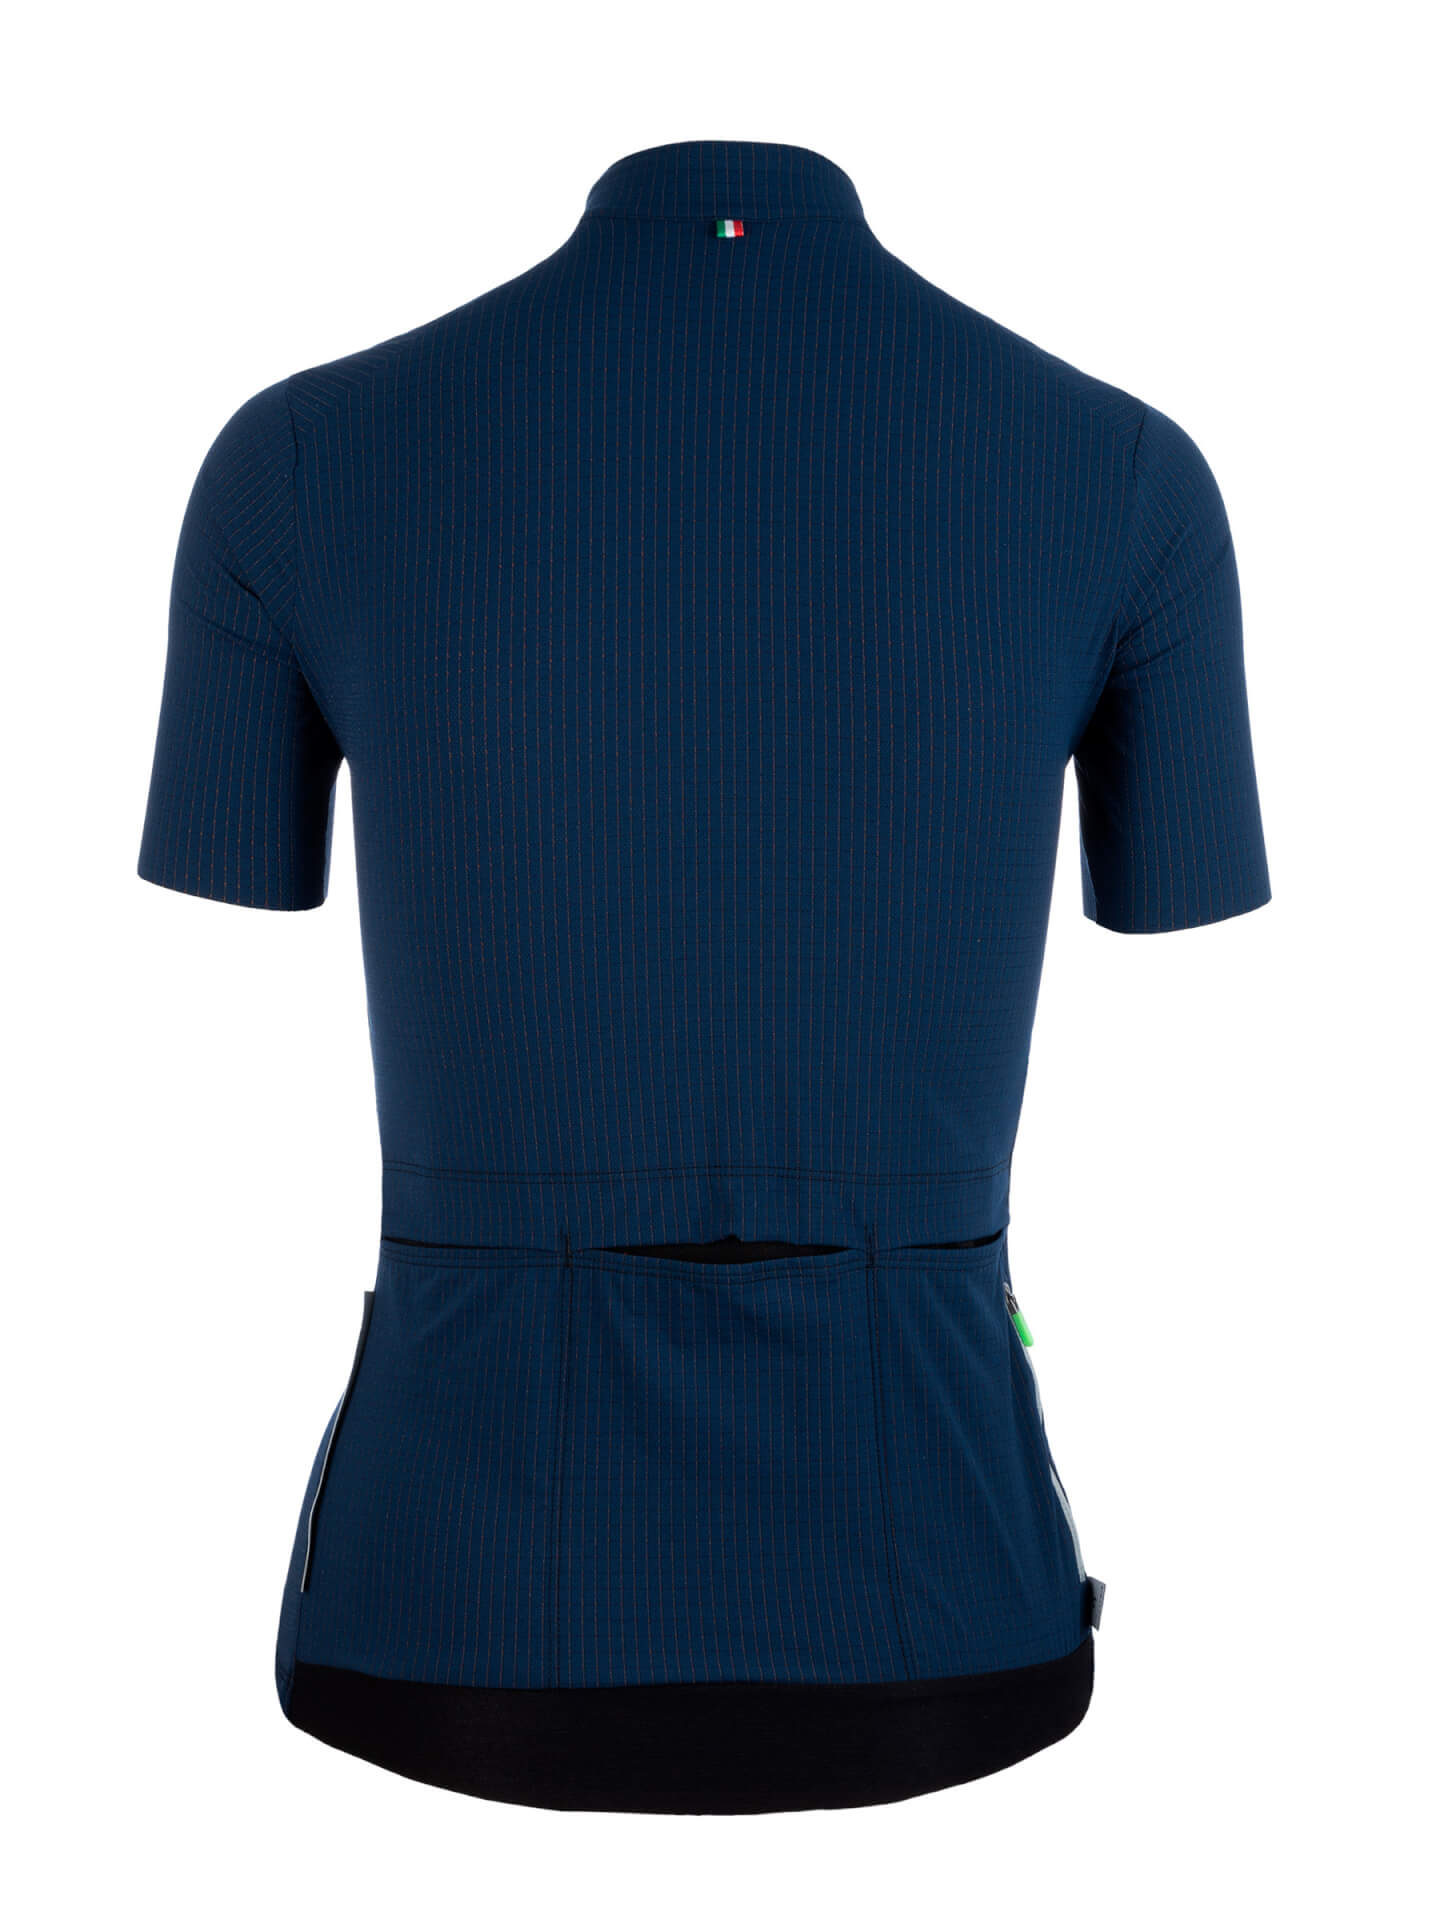 Maillot manches courtes L1 Woman Pinstripe X Bleu marine